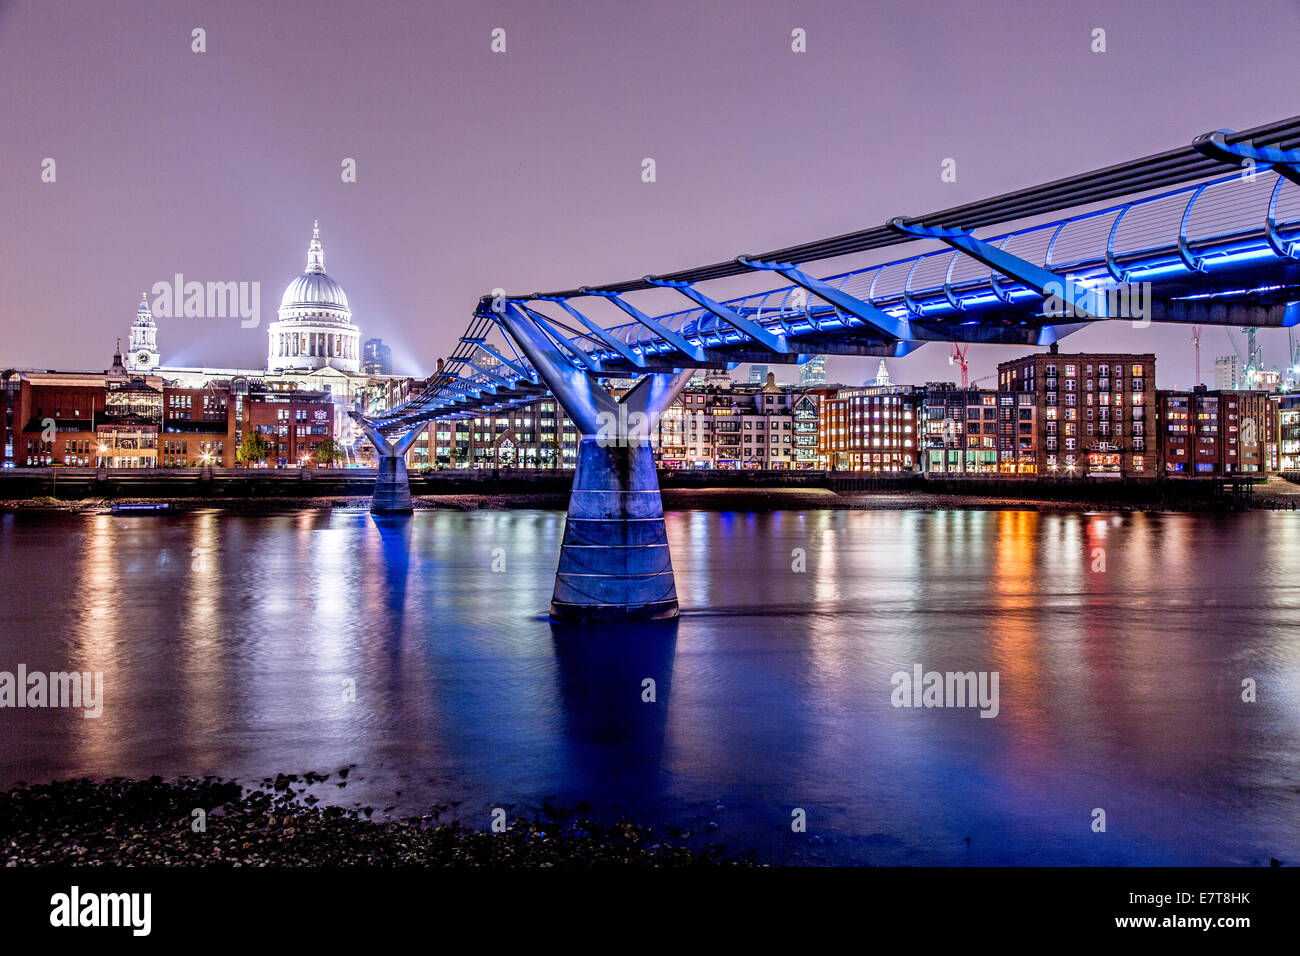 Millennium Bridge and St. Pauls Cathedral at Night London UK Stock Photo